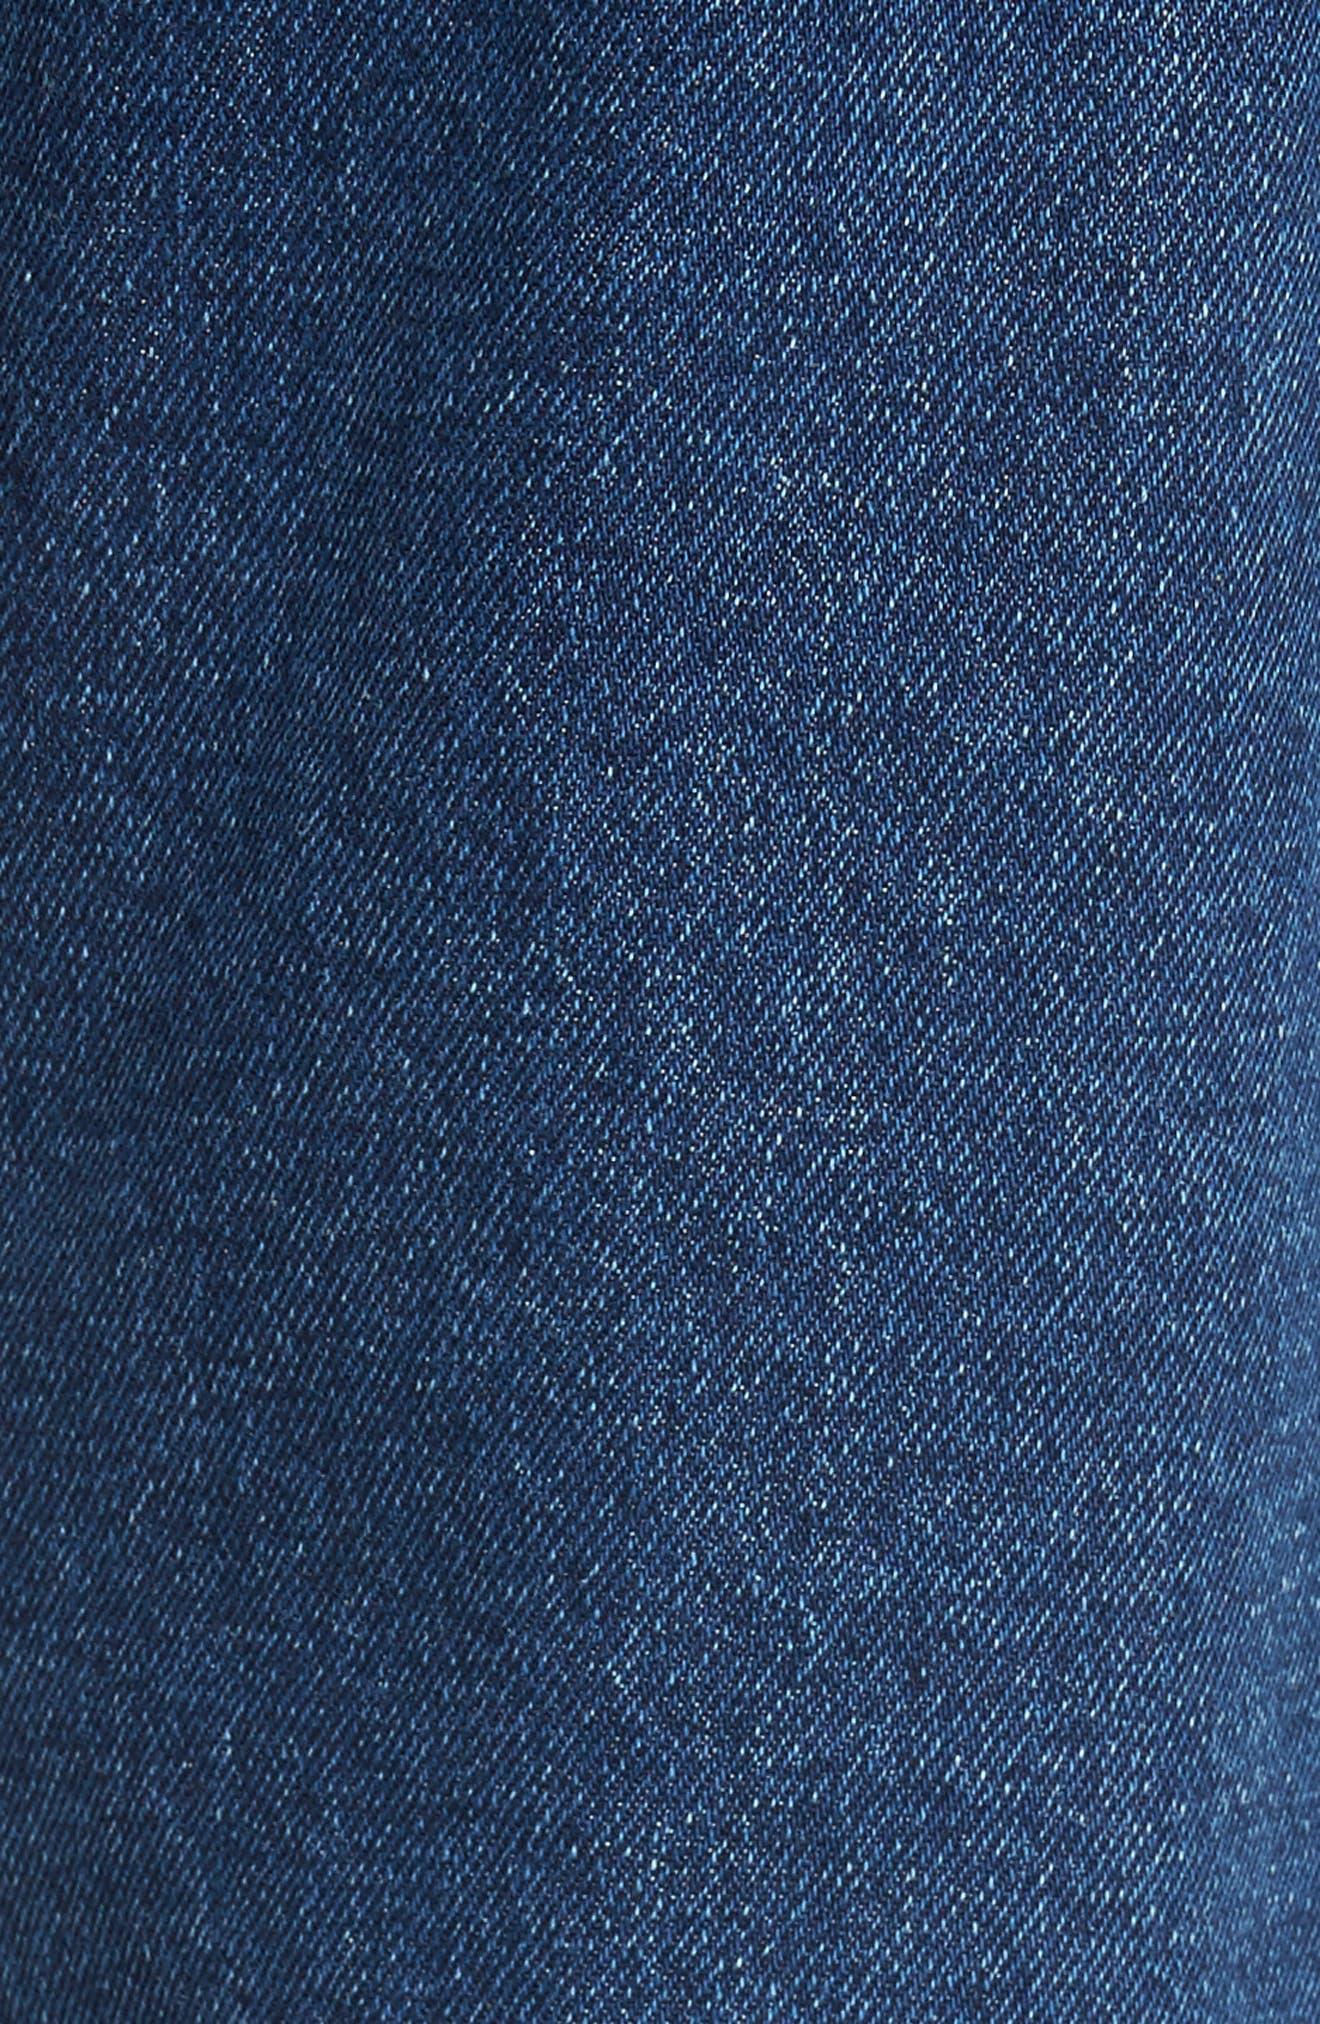 Alternate Image 5  - Tommy Hilfiger 90s Classic Straight Leg Jeans (Denim Blue)